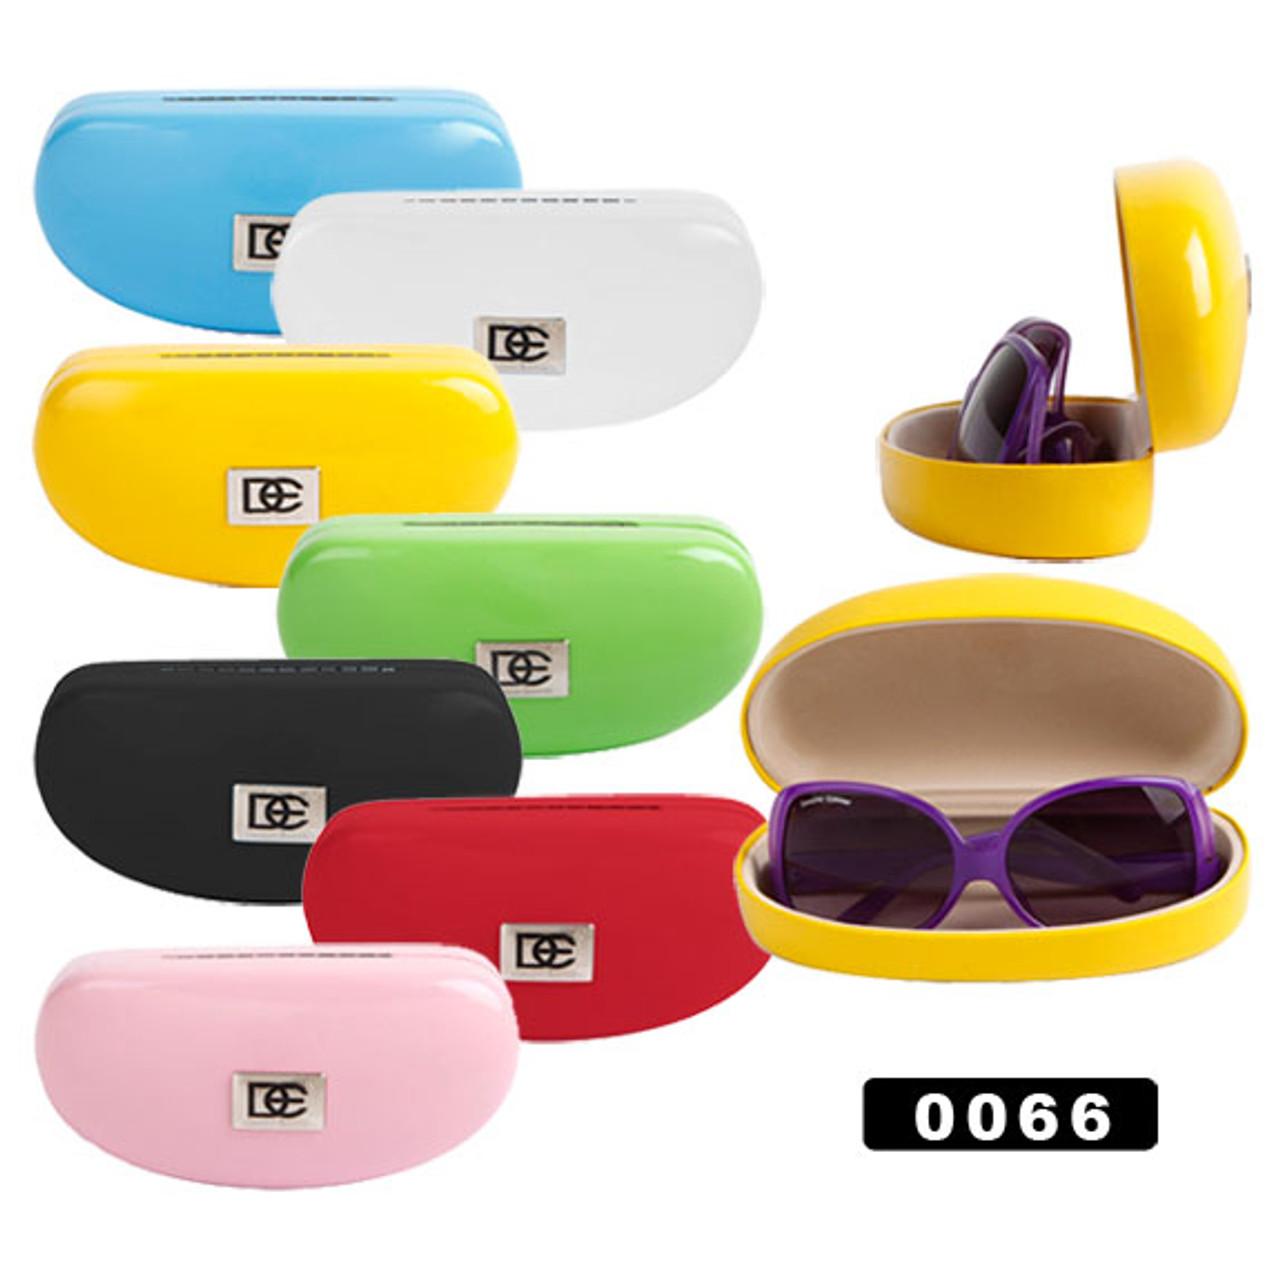 DE Sunglass Hard Cases 7 Colors